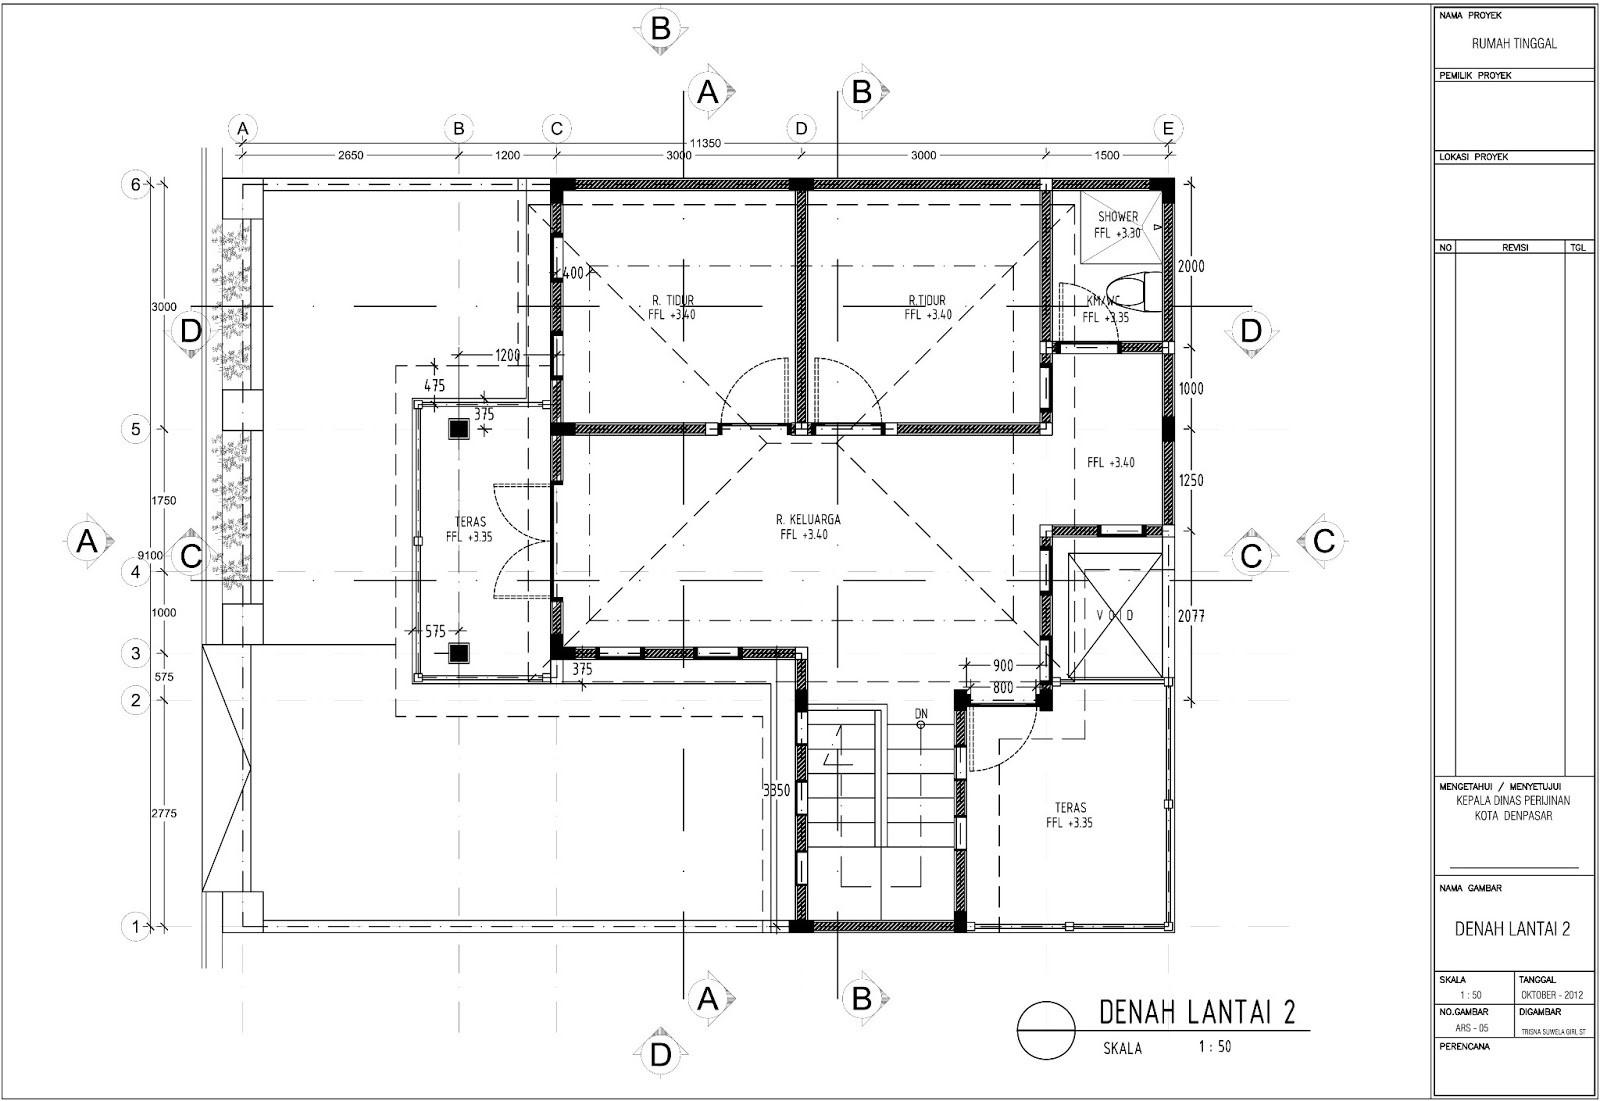 contoh gambar denah rumah untuk imb 2